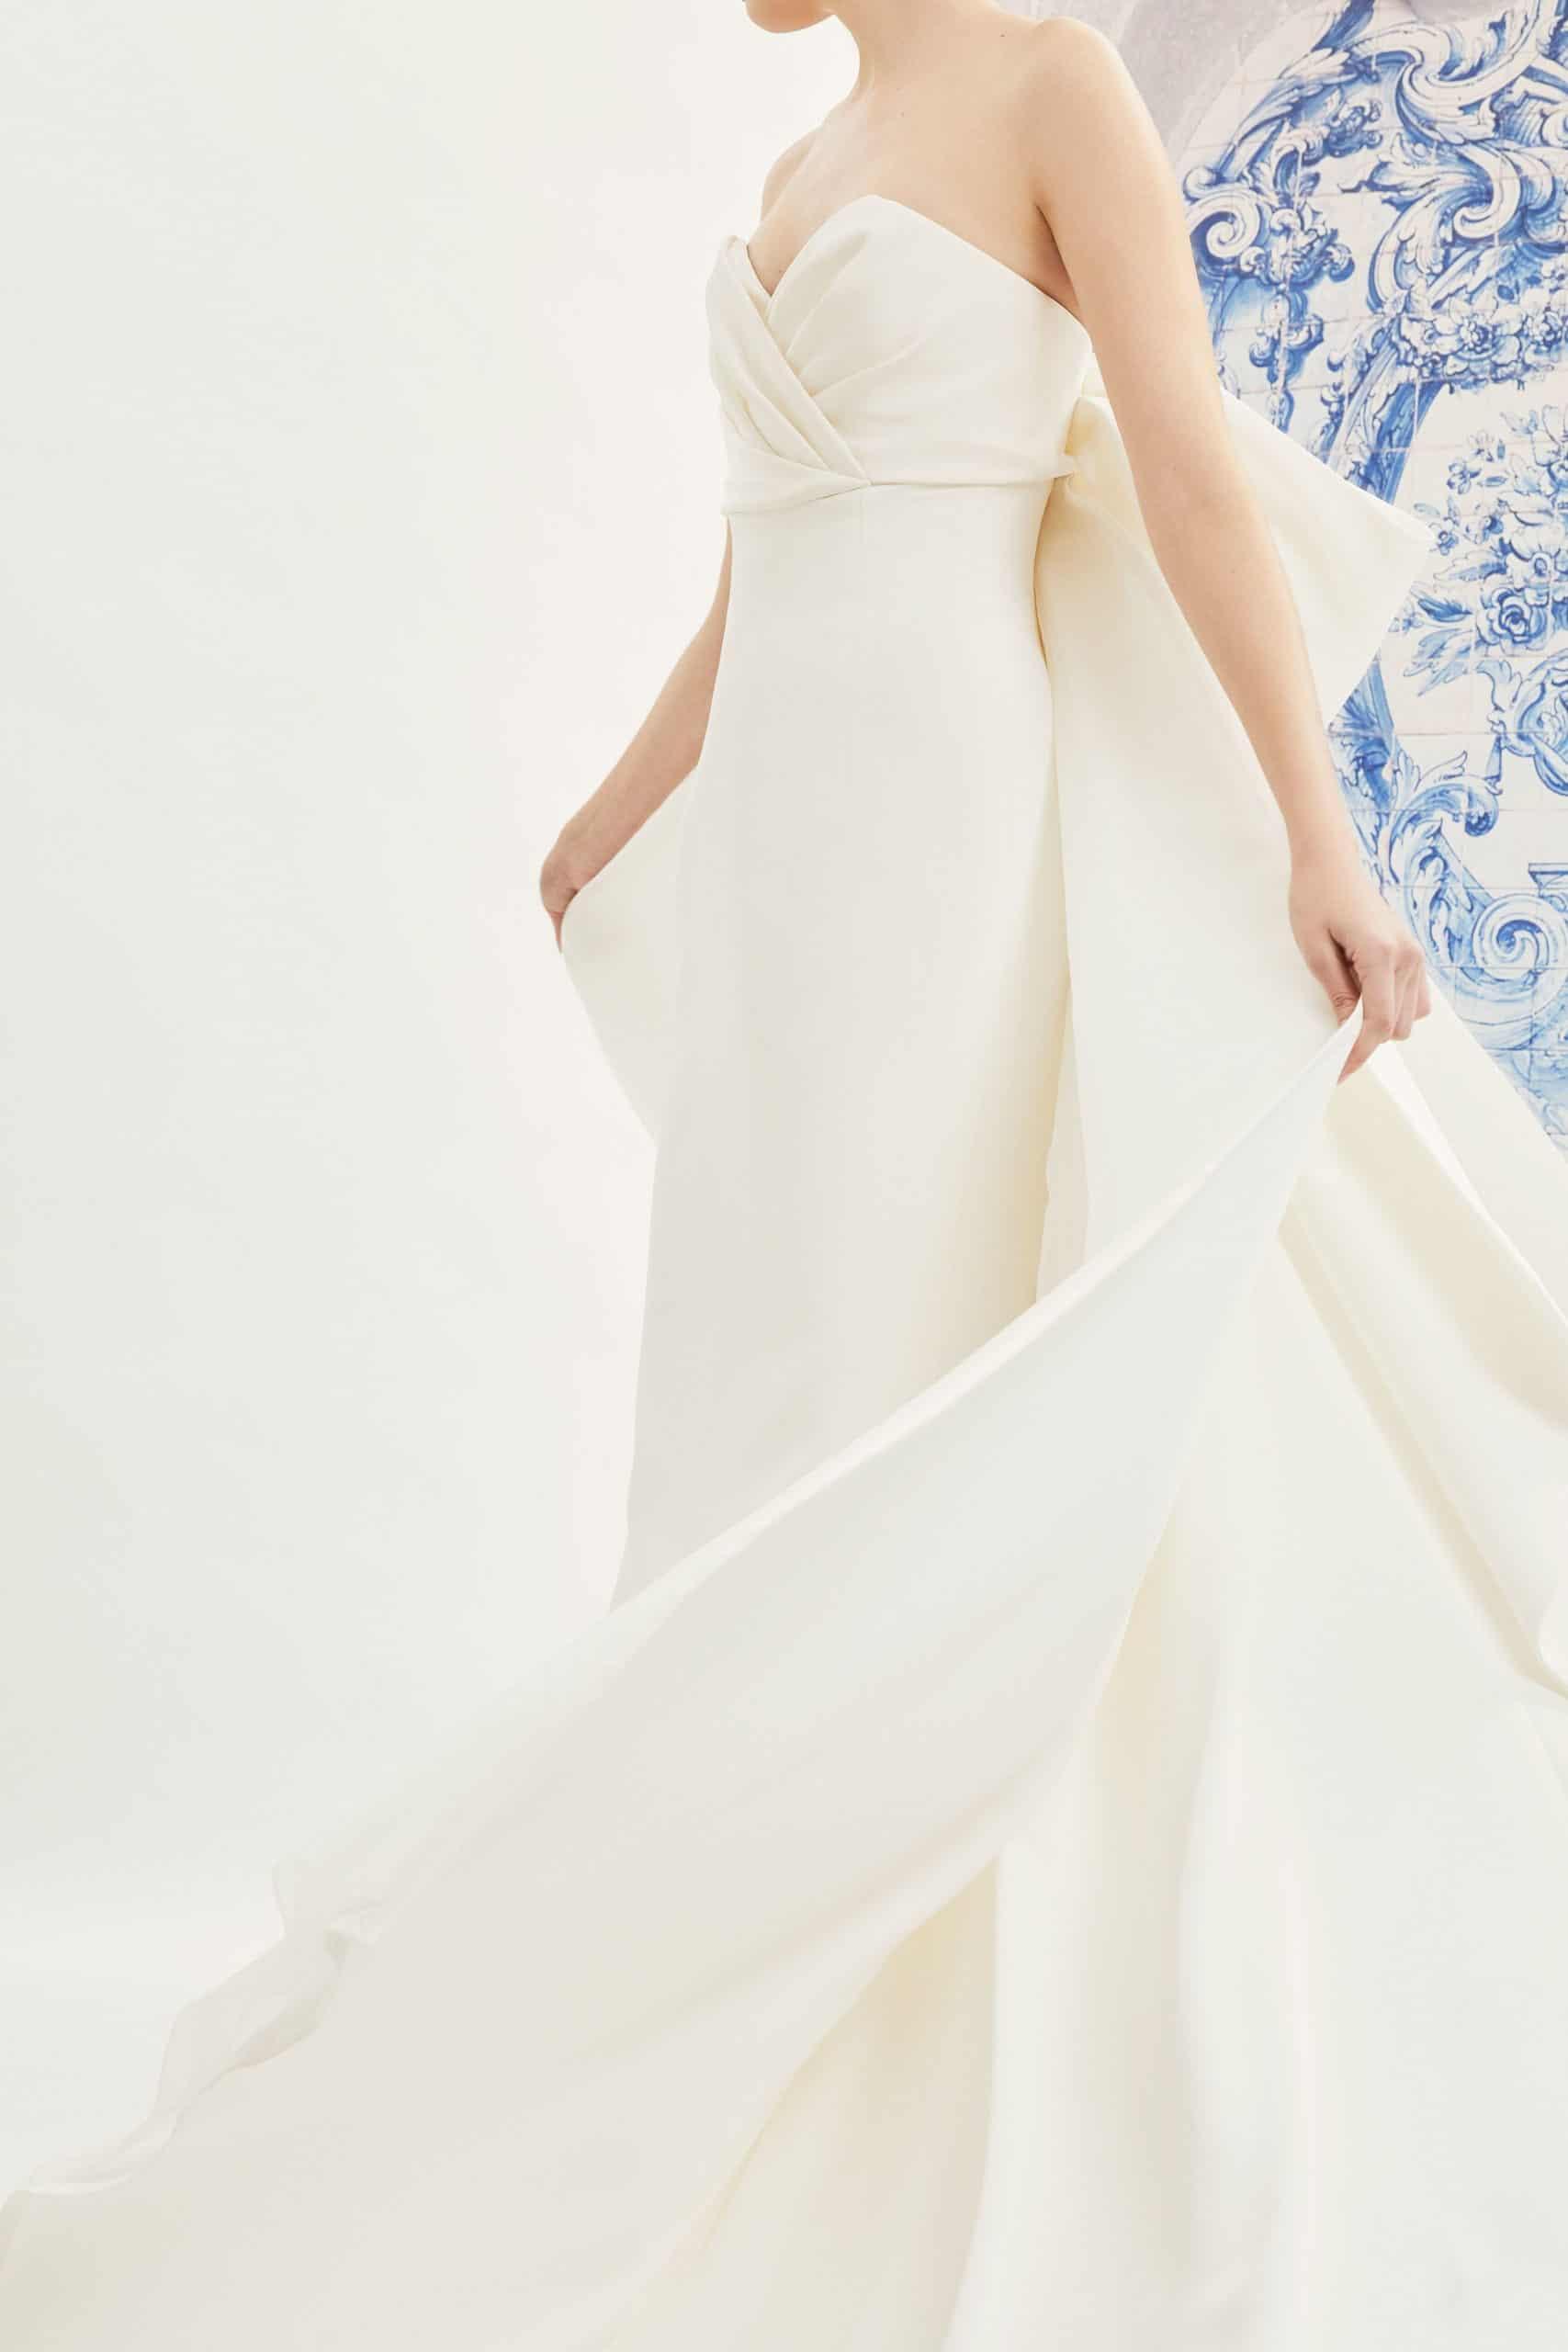 strapless wedding dress with back bow with tail by Carolina Herrera